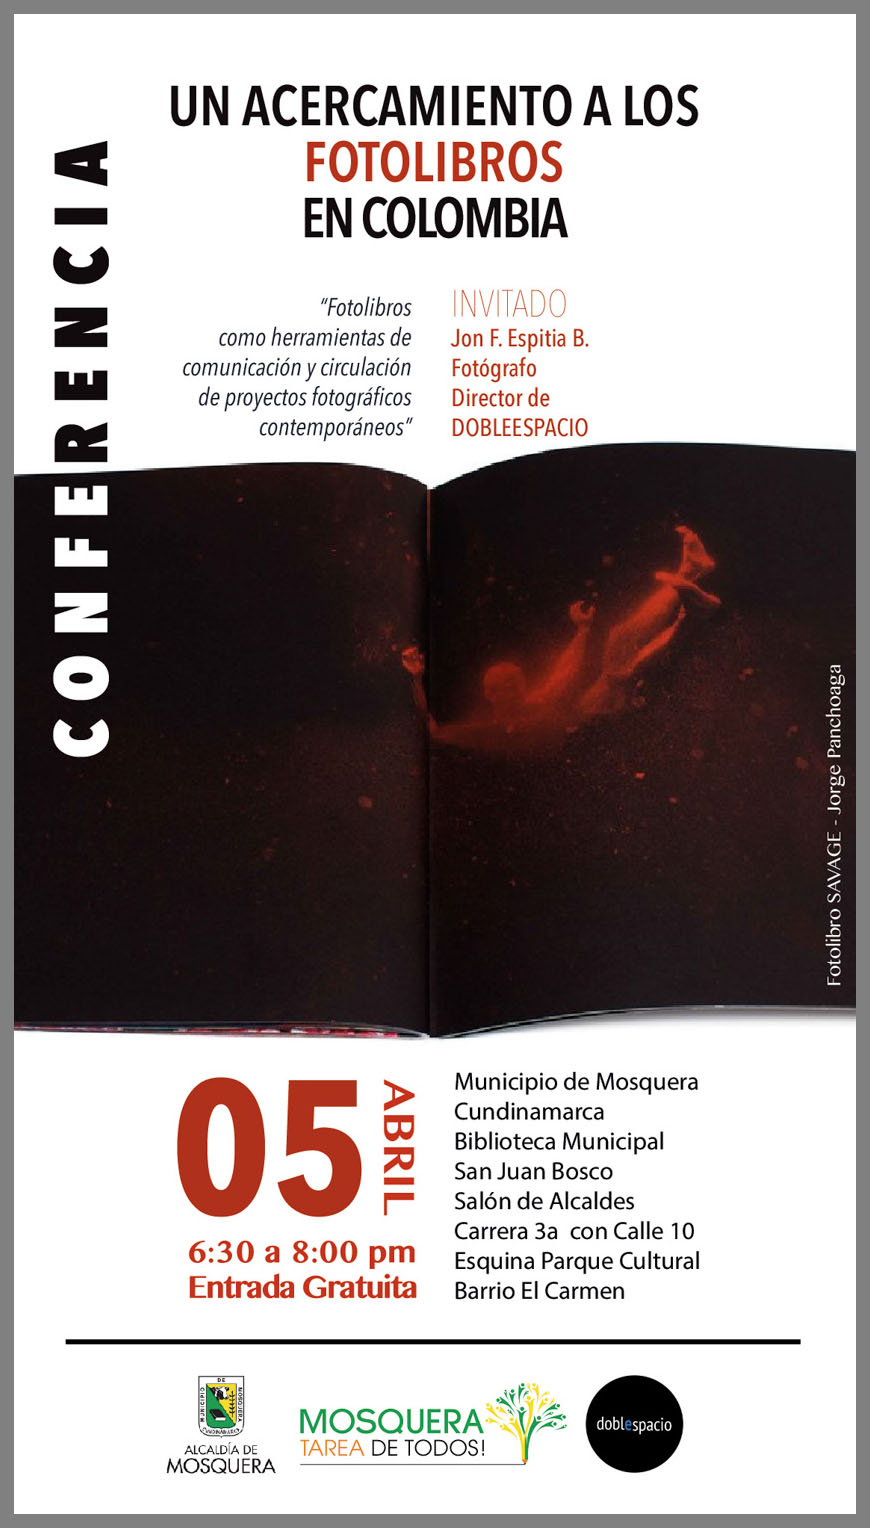 dobleesapcio eventos,fotolibros,fotolibroscolombianos-37.jpg